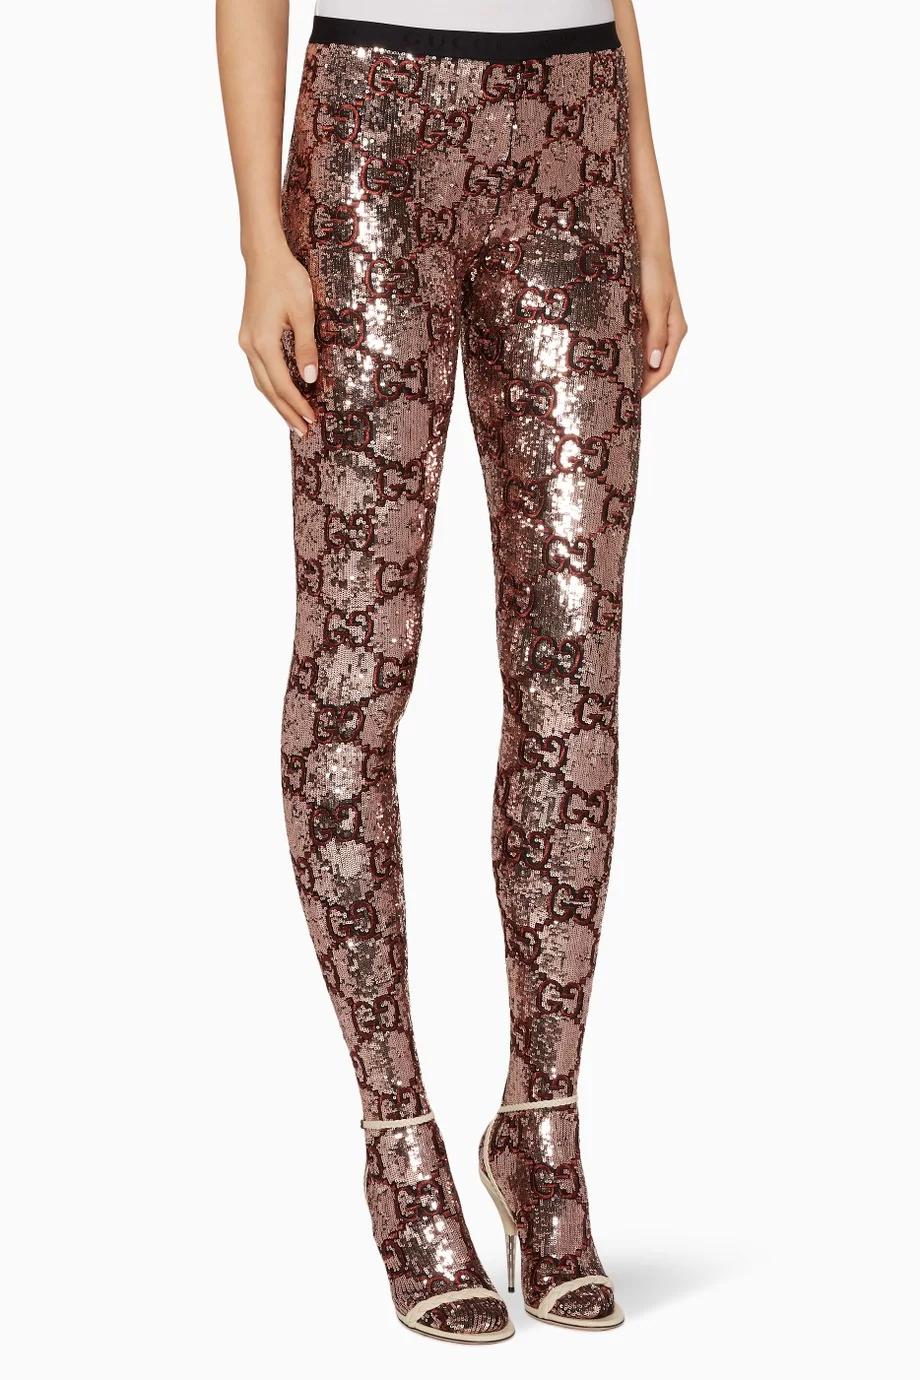 Allblack x Gucci Tights in 2020 Strumpfhose, Hosen